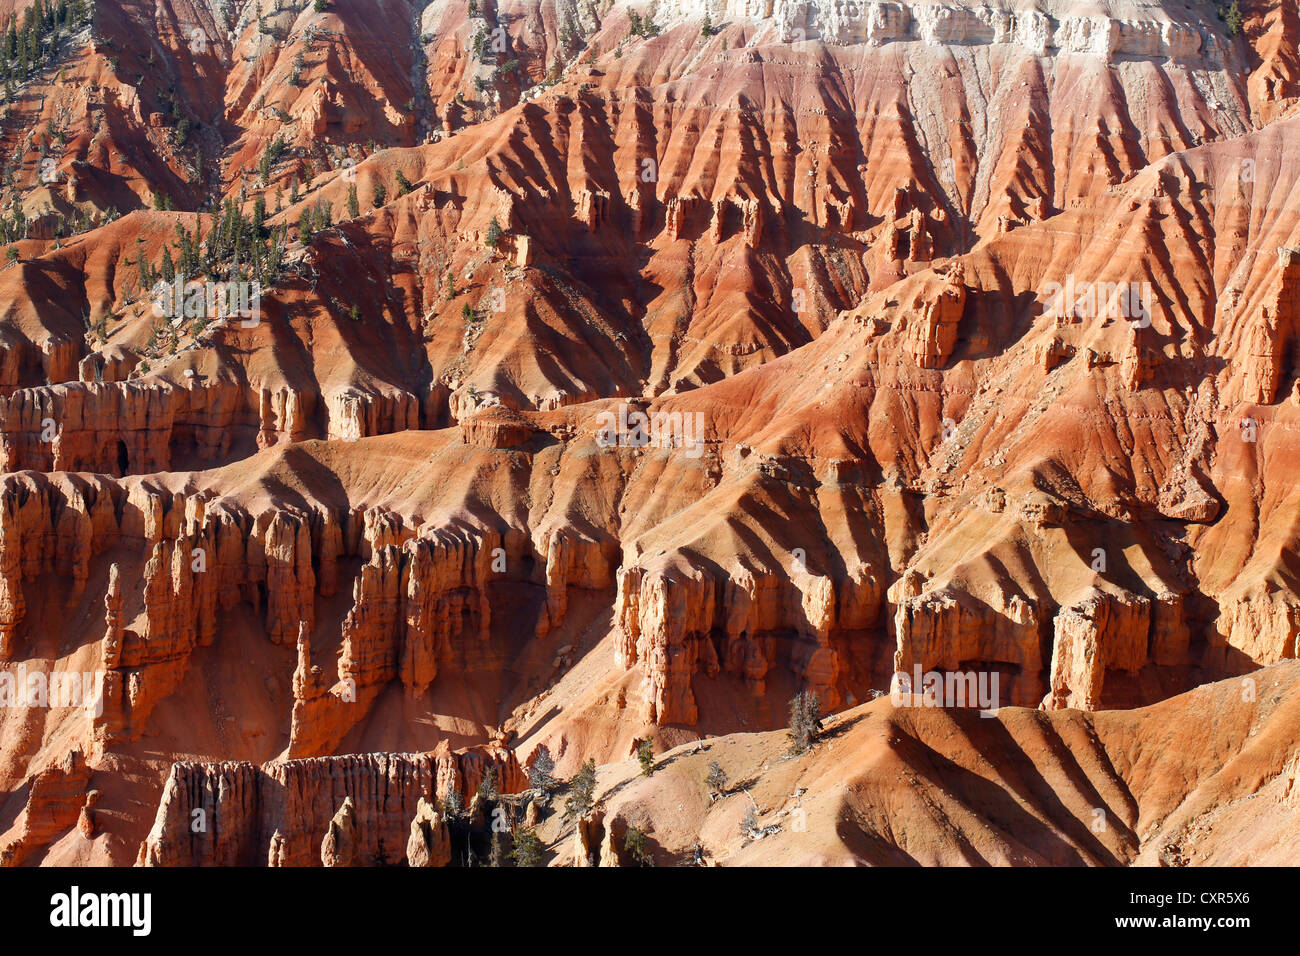 Sandstone cliffs in Cedar Breaks National Monument, Brian Head, Utah, USA - Stock Image